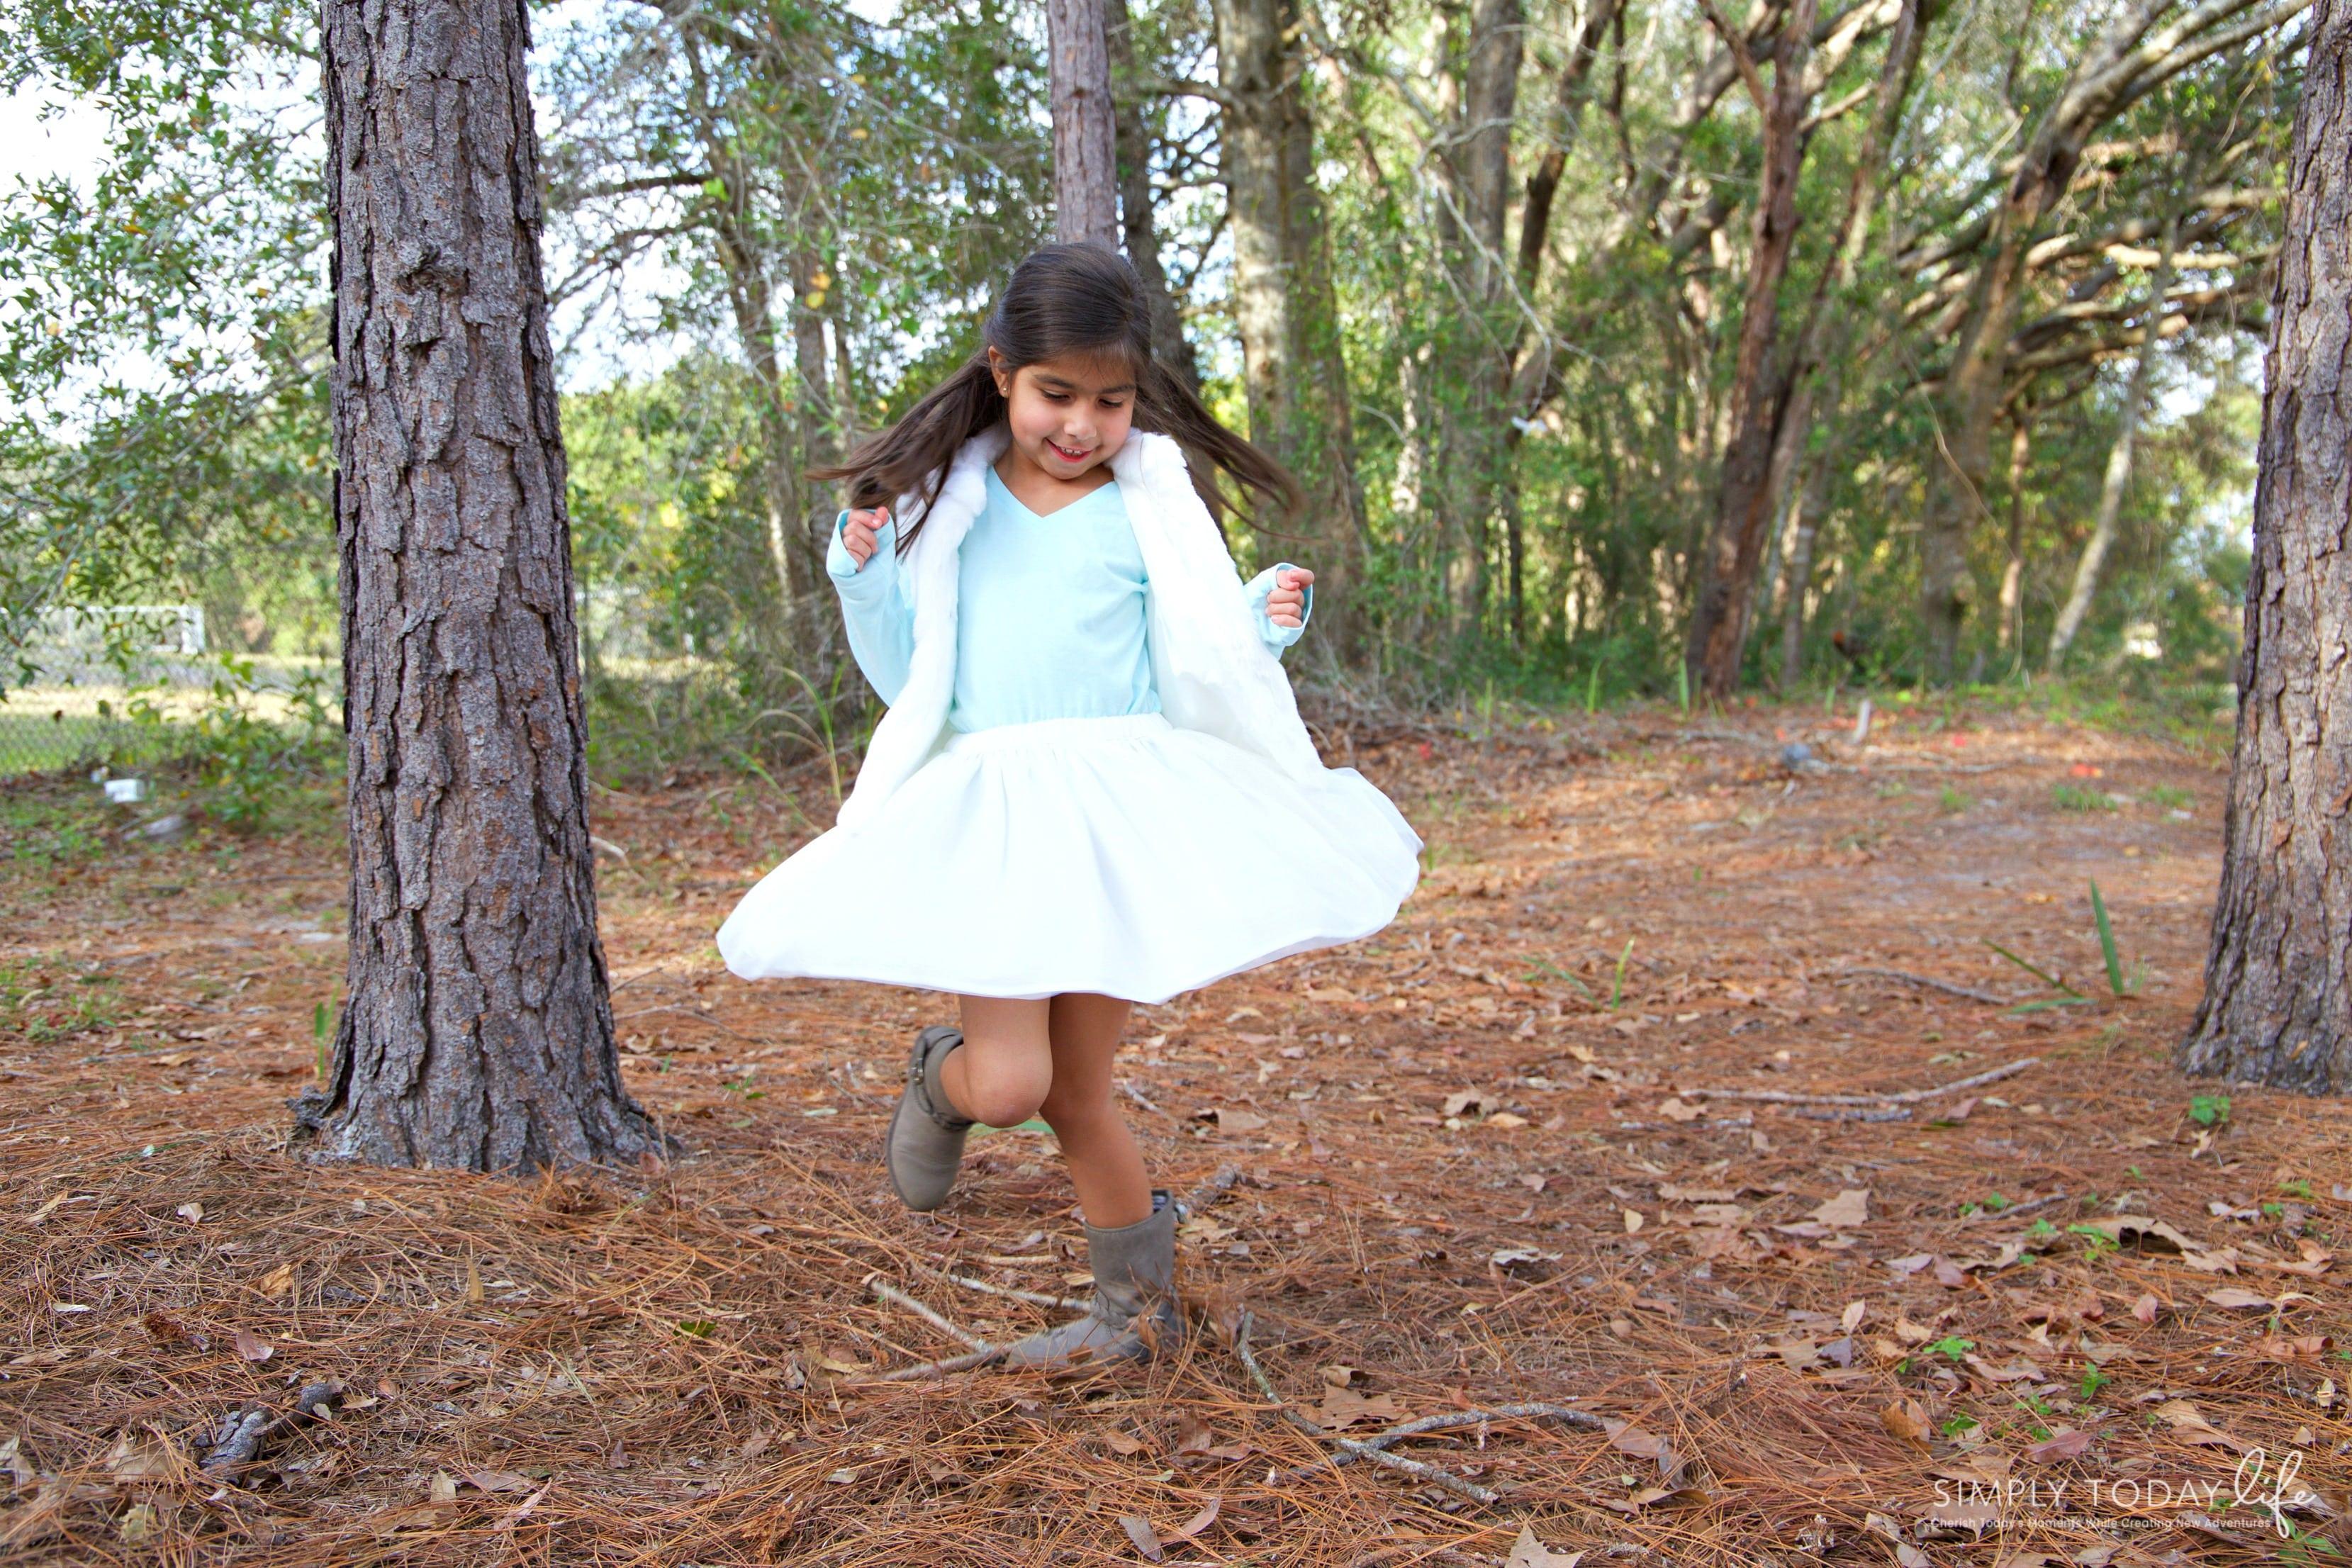 Meaningful Family Holiday Traditions + $50 OshKosh B'gosh Giveaway - Holiday Dance